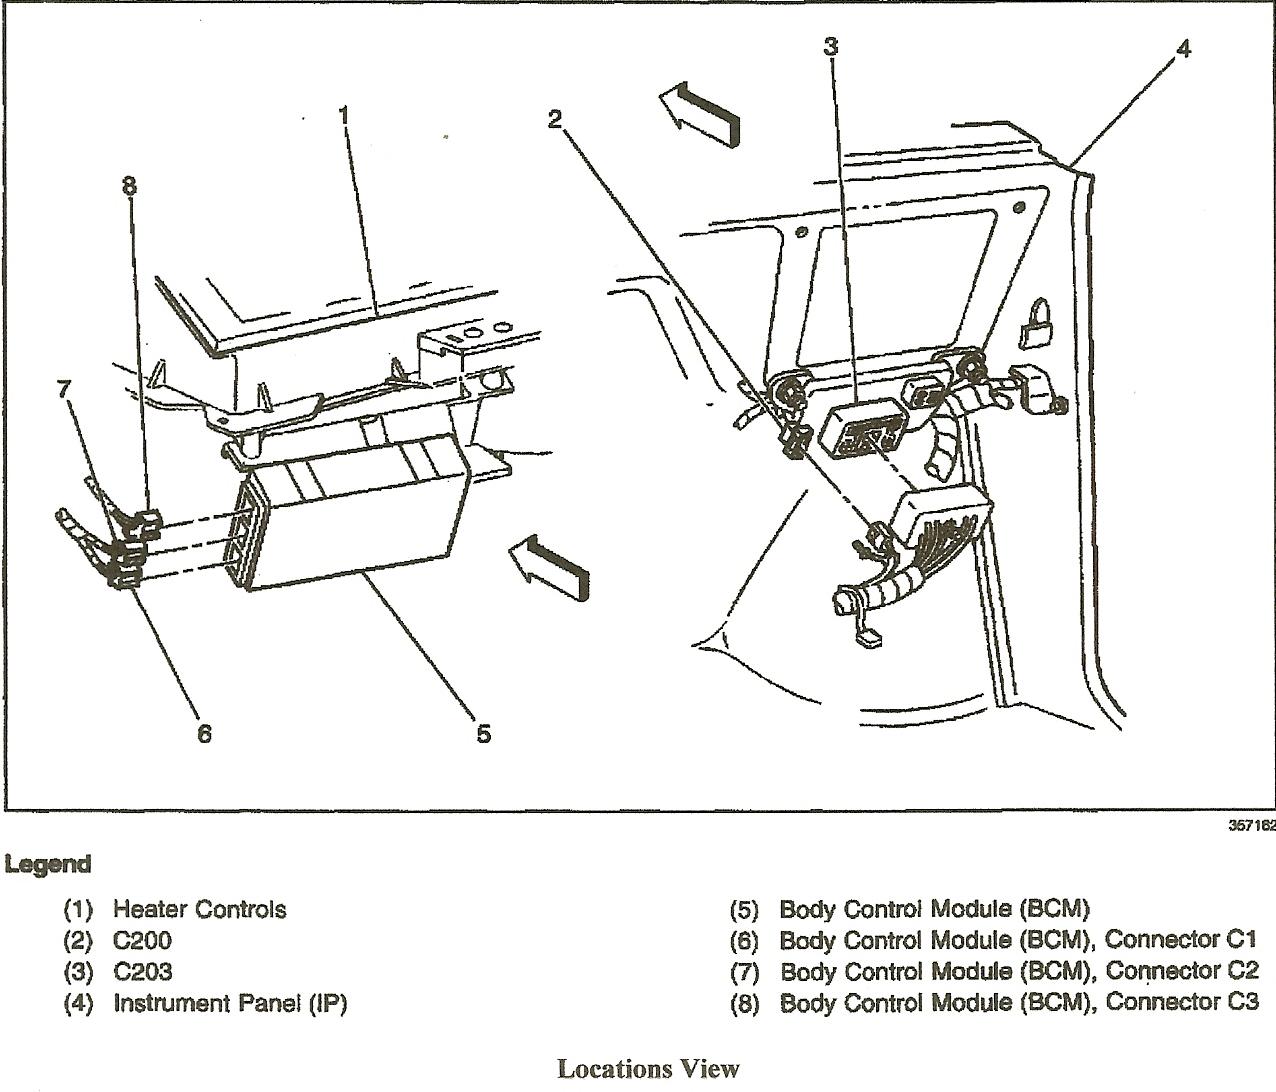 2001 pontiac grand prix abs wiring diagram. 2001. discover your, Wiring diagram